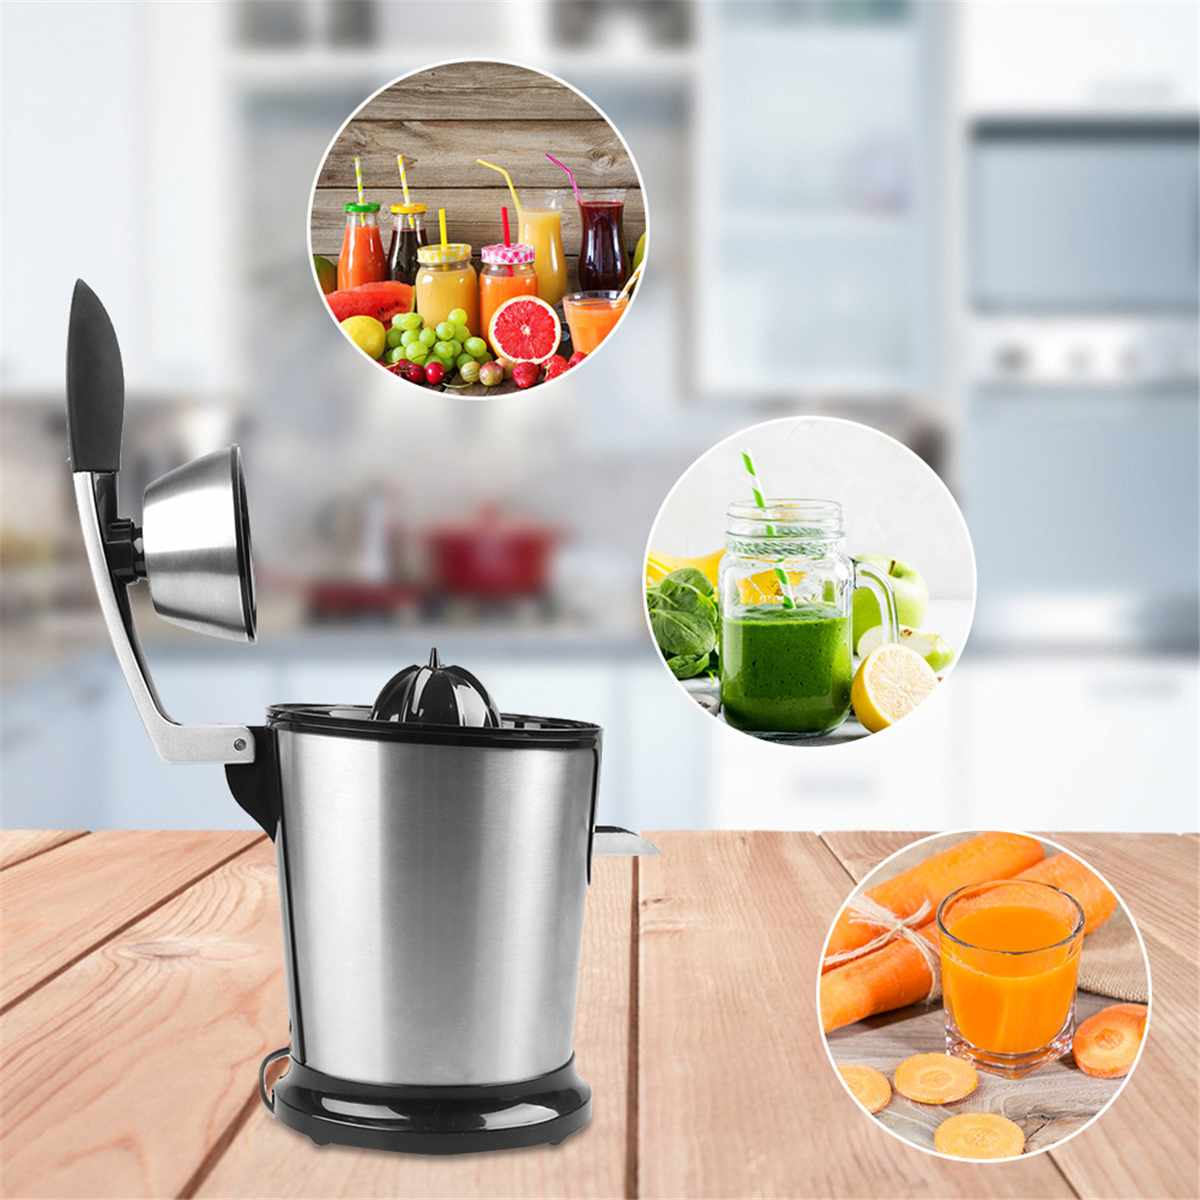 160W Lemon Citrus Juicer in Blender Electric Cold Press Juicer Citrus Juice Extractor Stainless Steel Queezer Sonifer Easy Use